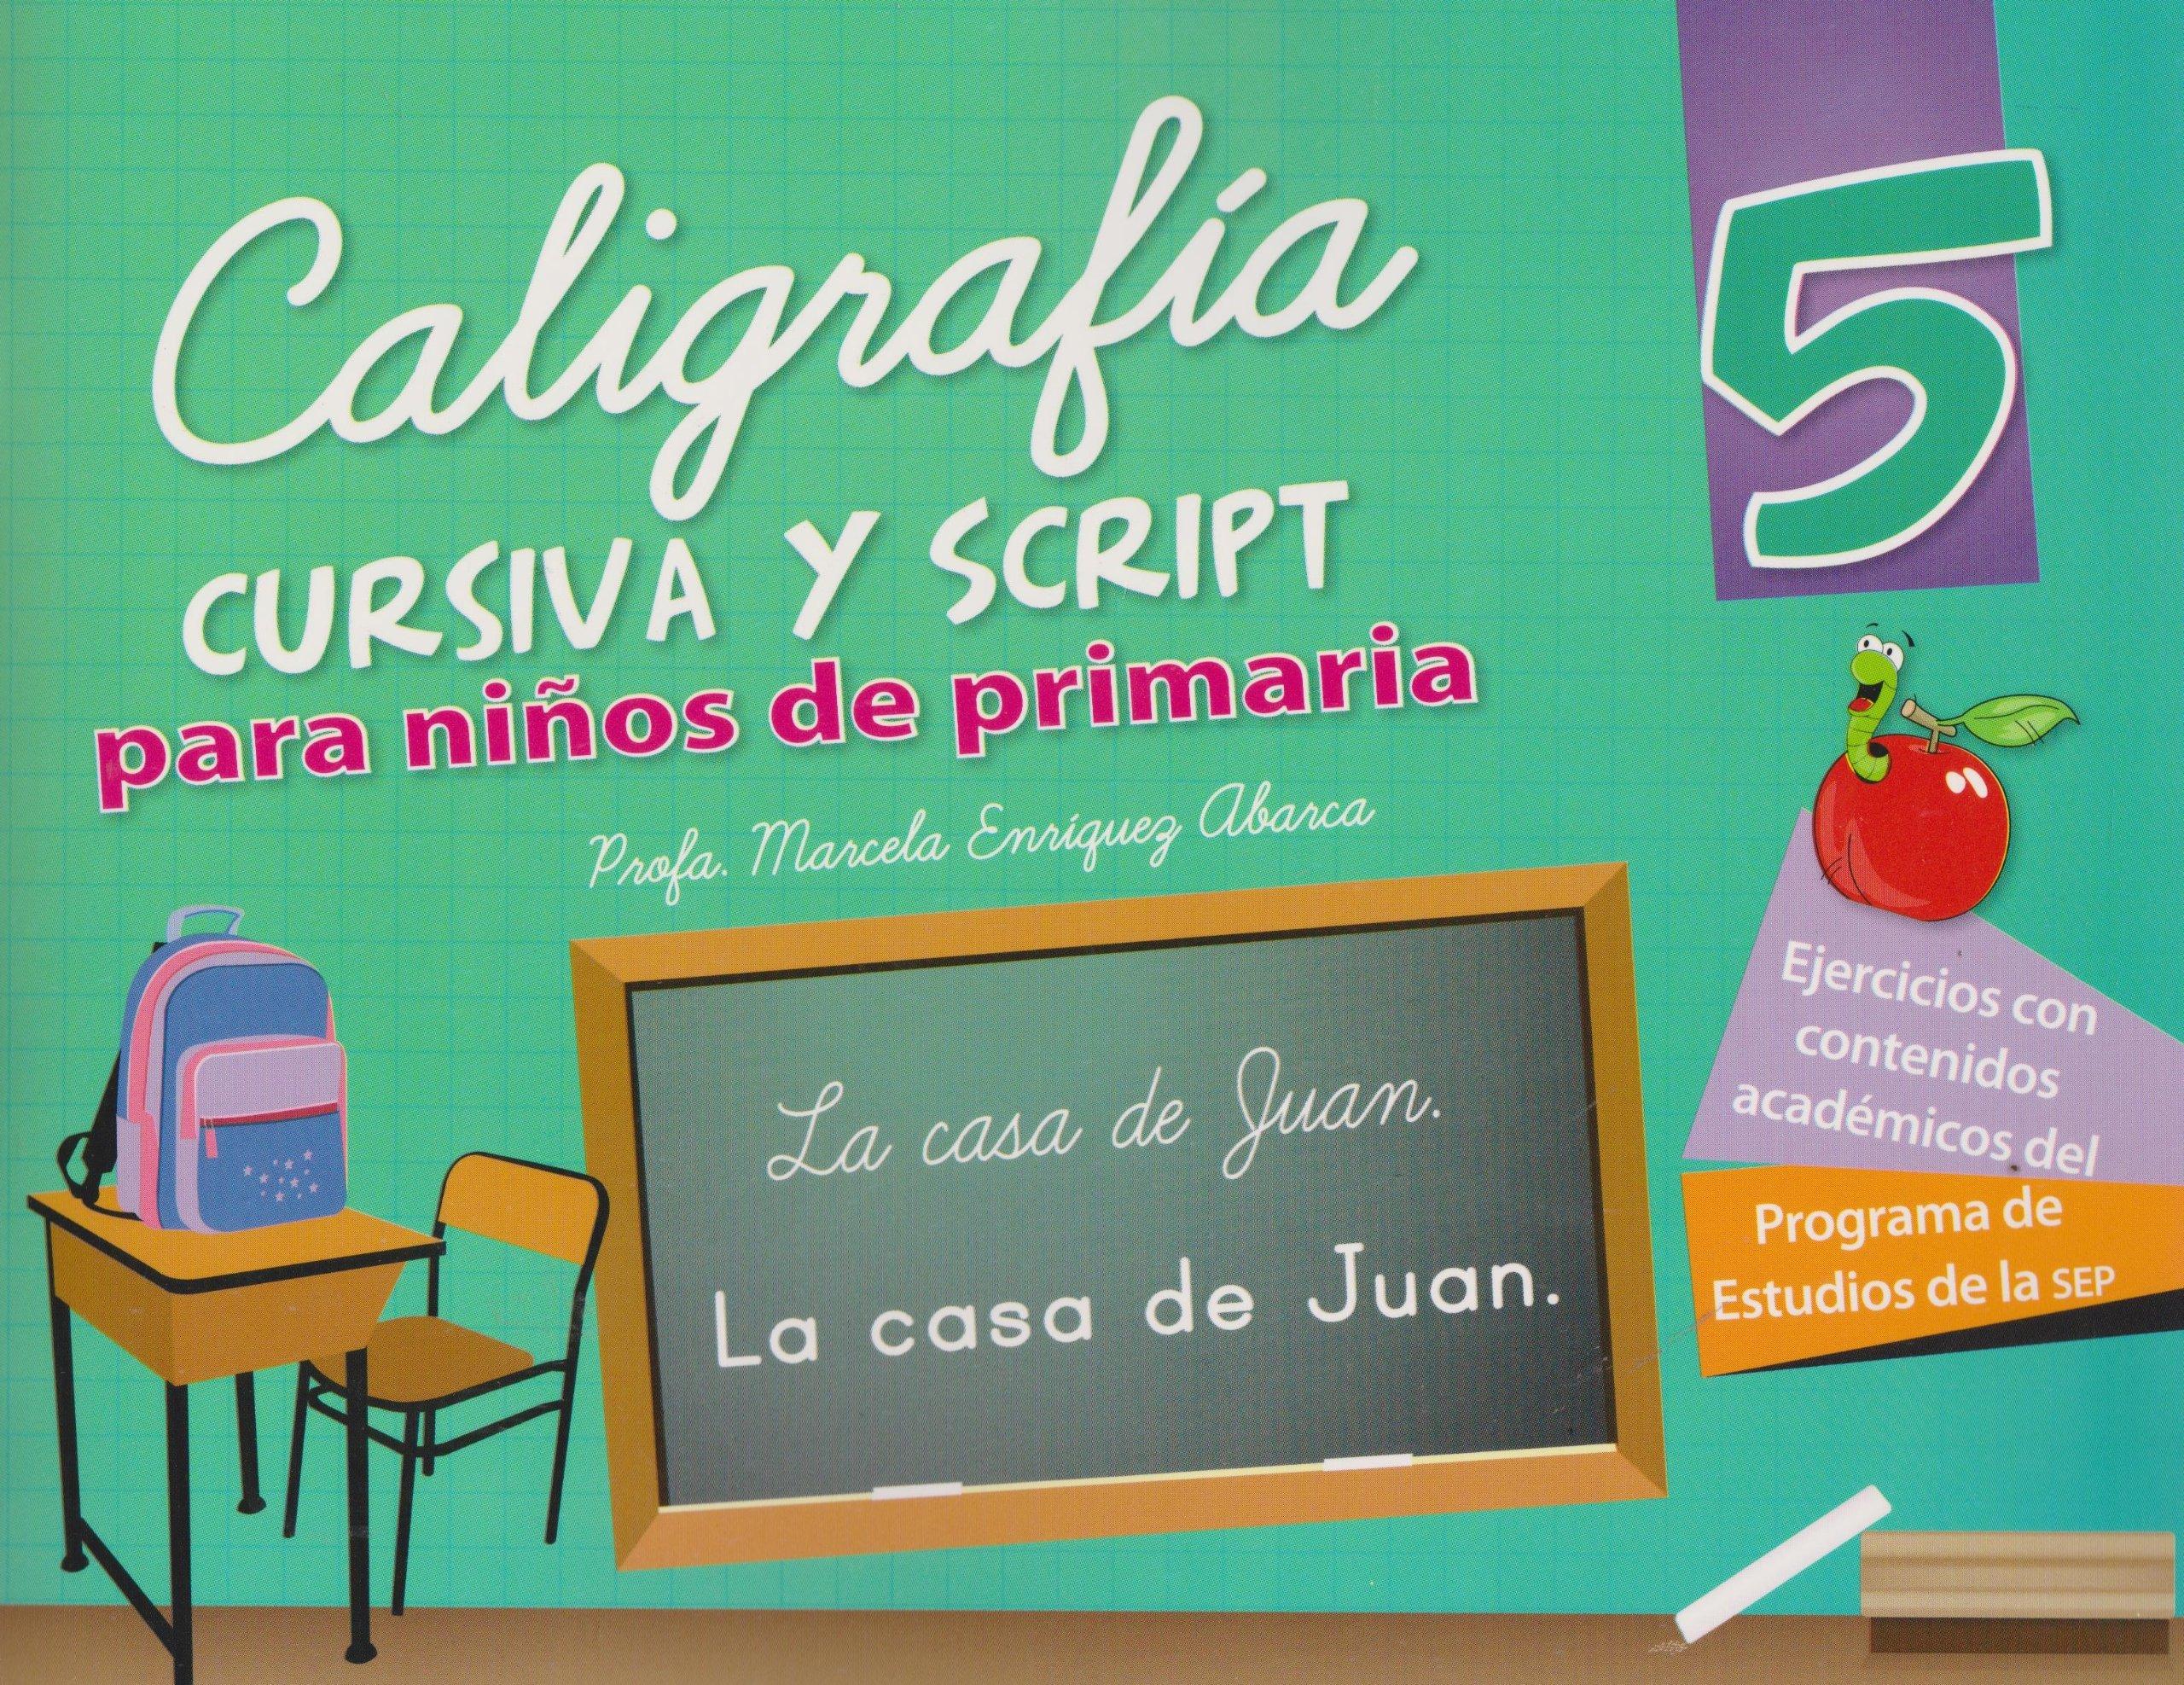 Caligrafia cursiva y script 5 para ninos de primaria (Spanish Edition): Marcela Profa. Enriquez Abarca: 9786071412157: Amazon.com: Books